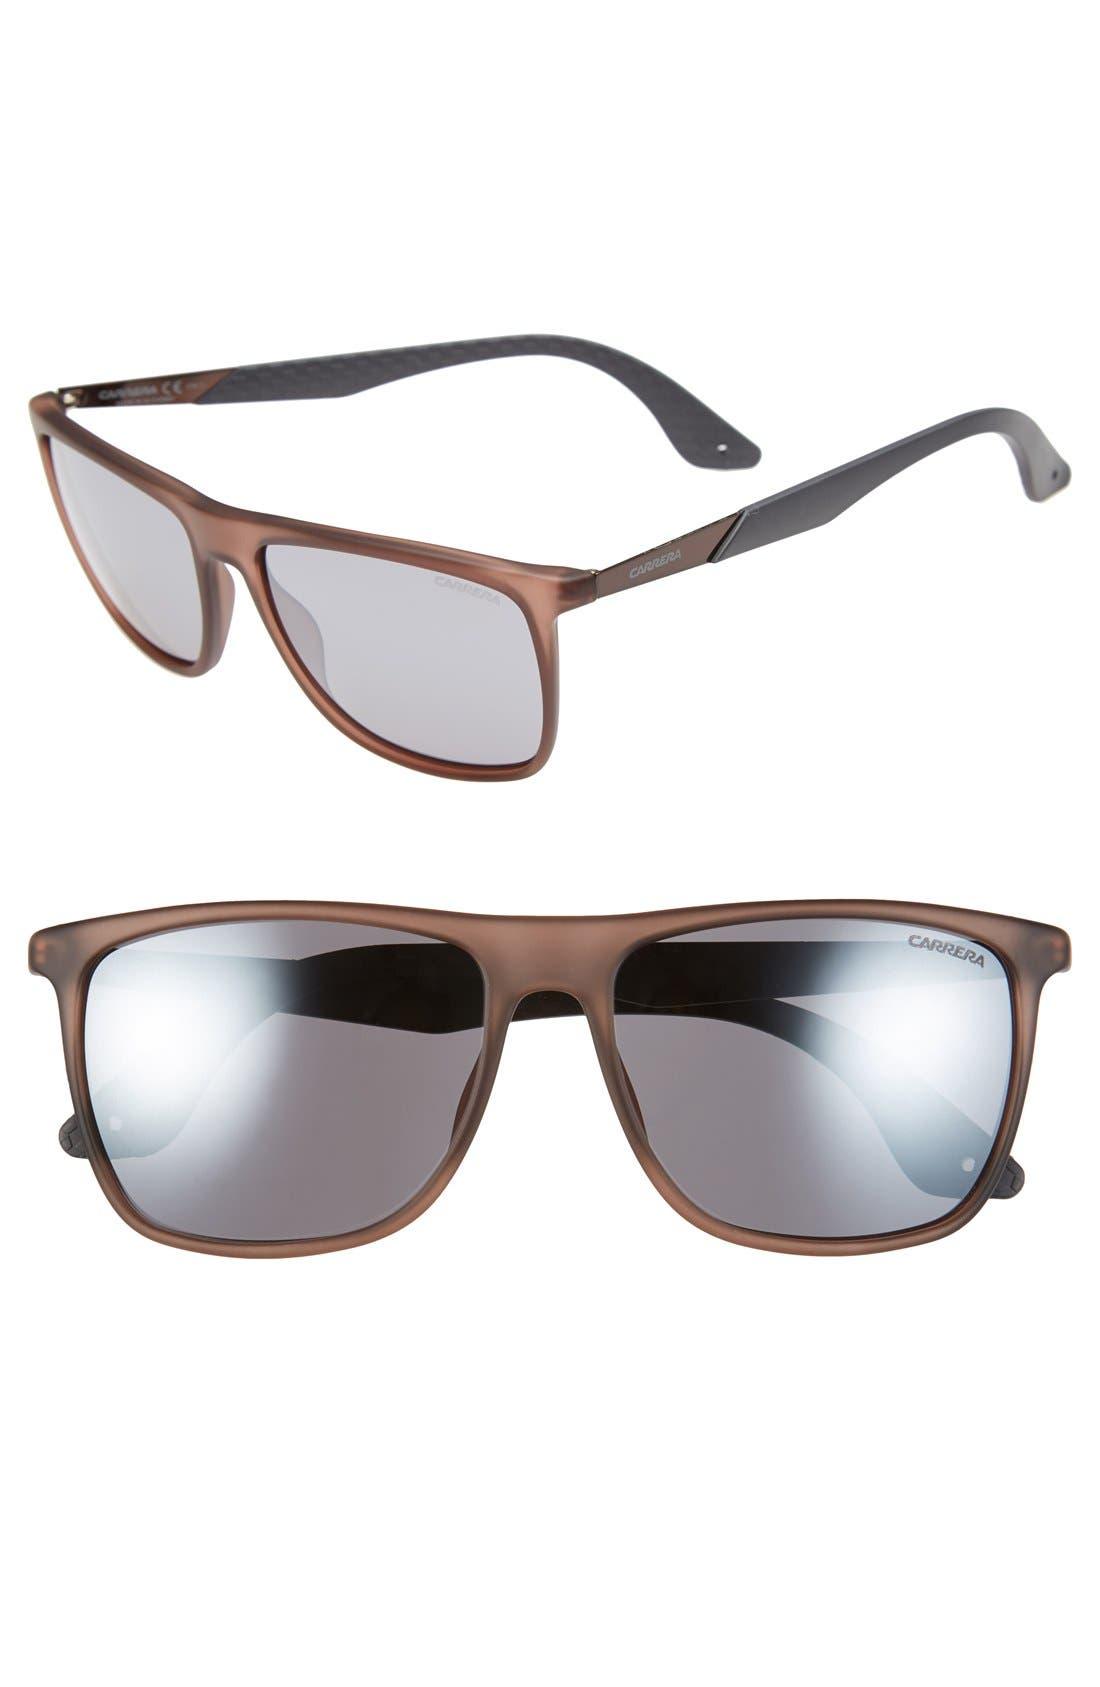 CARRERA EYEWEAR, 56mm Retro Sunglasses, Main thumbnail 1, color, MATTE BROWN/ GREY FLASH MIRROR